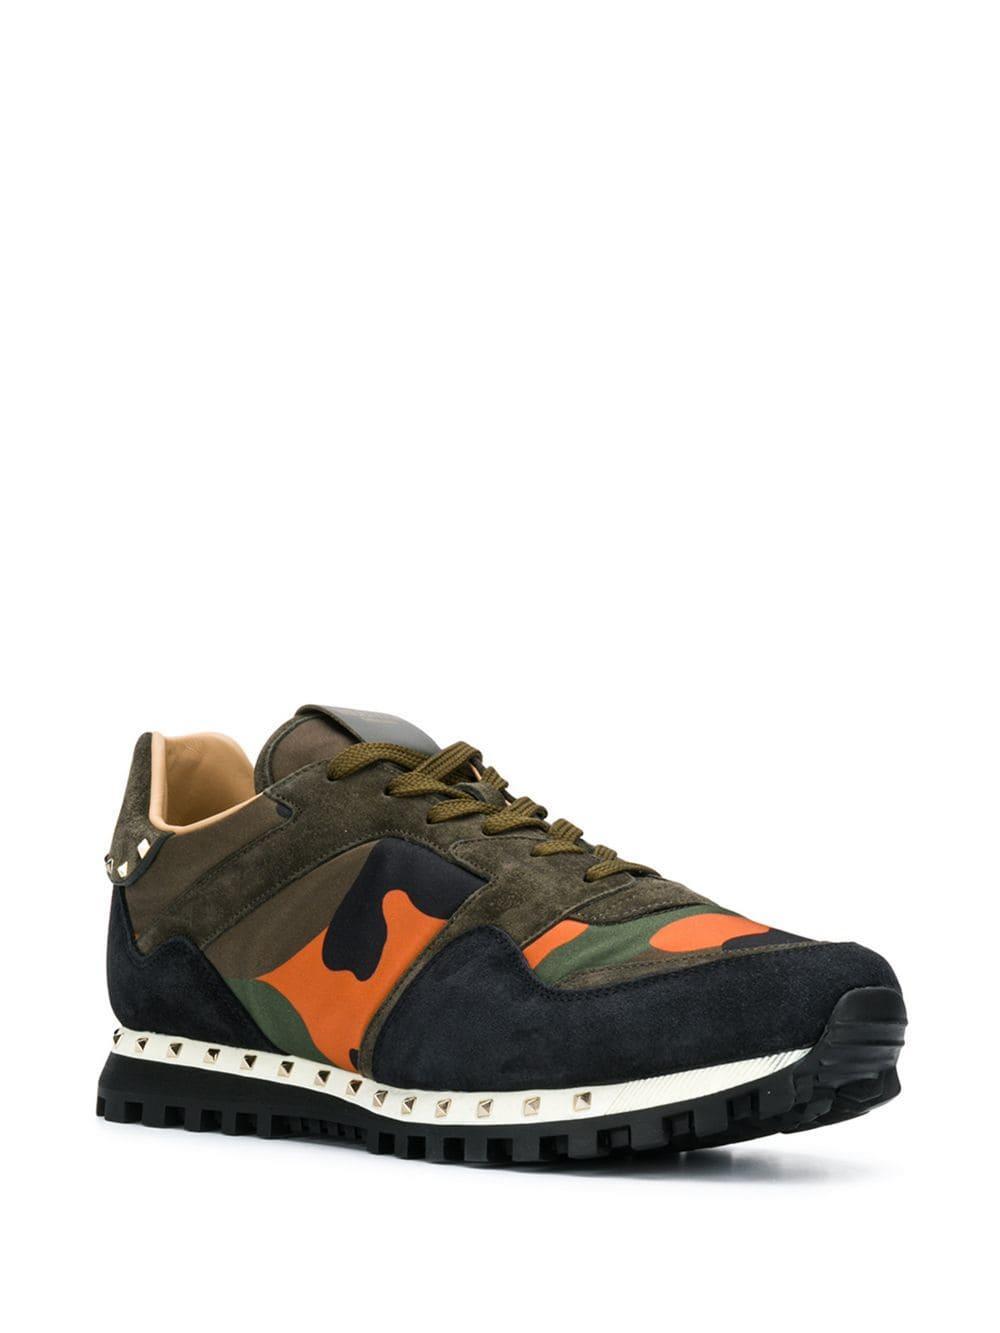 39ed3e0107aedd Lyst - Valentino Garavani Rockstud Rockrunner Camouflage Sneakers in Green  for Men